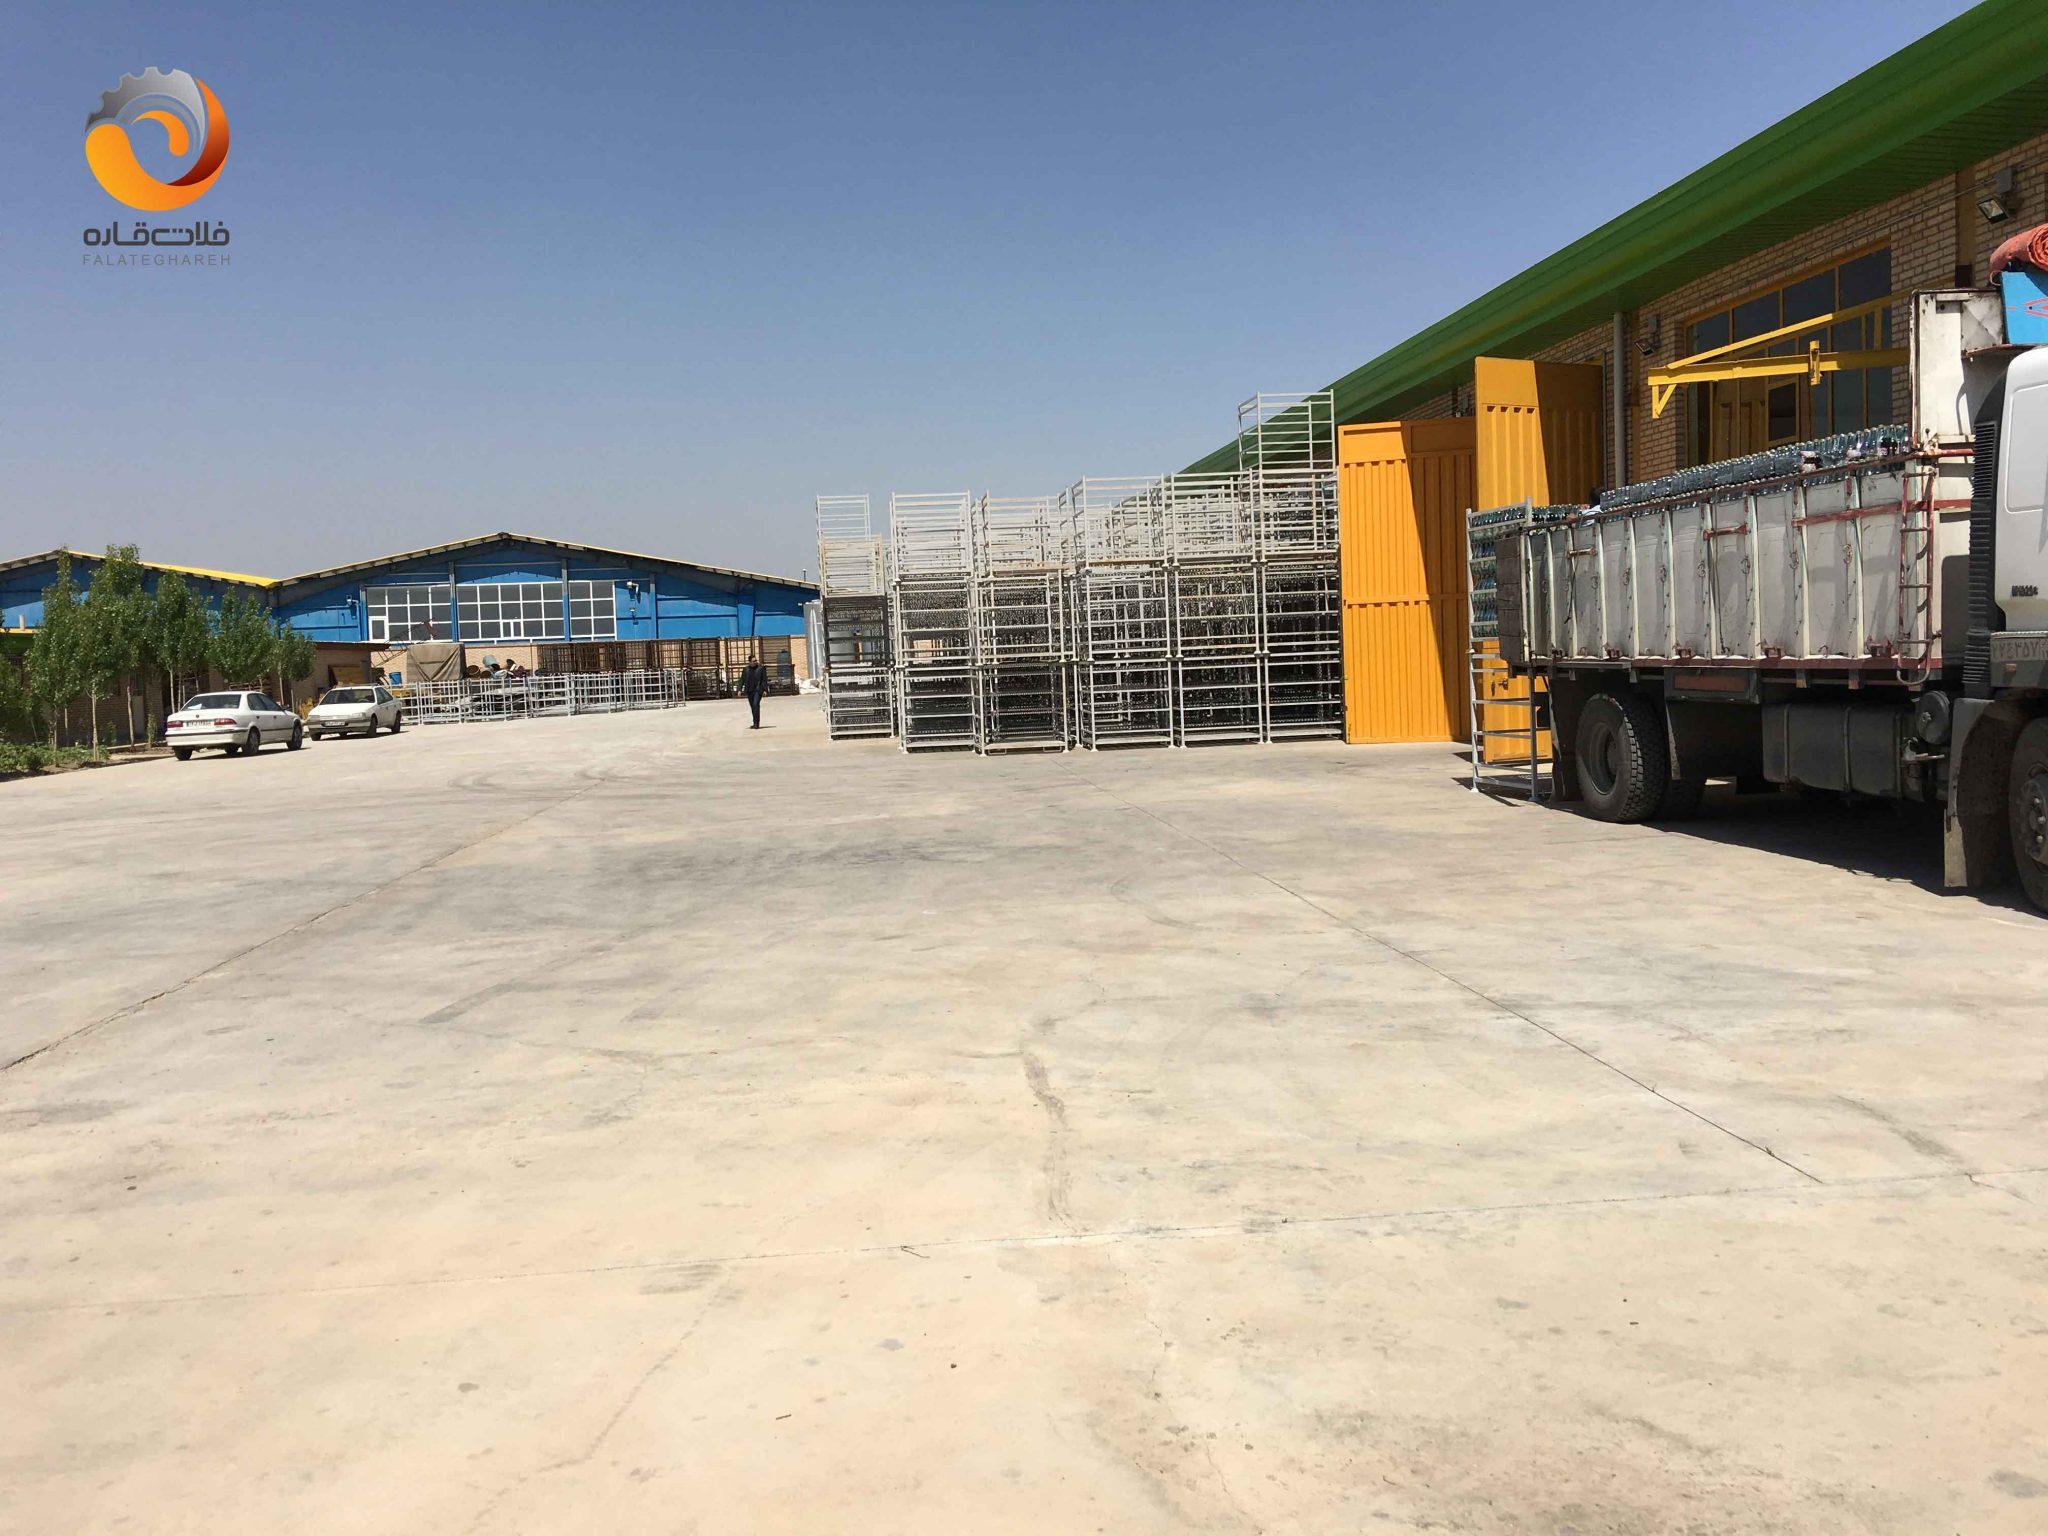 فروش کارخانه آب و ماءالشعیر تهران